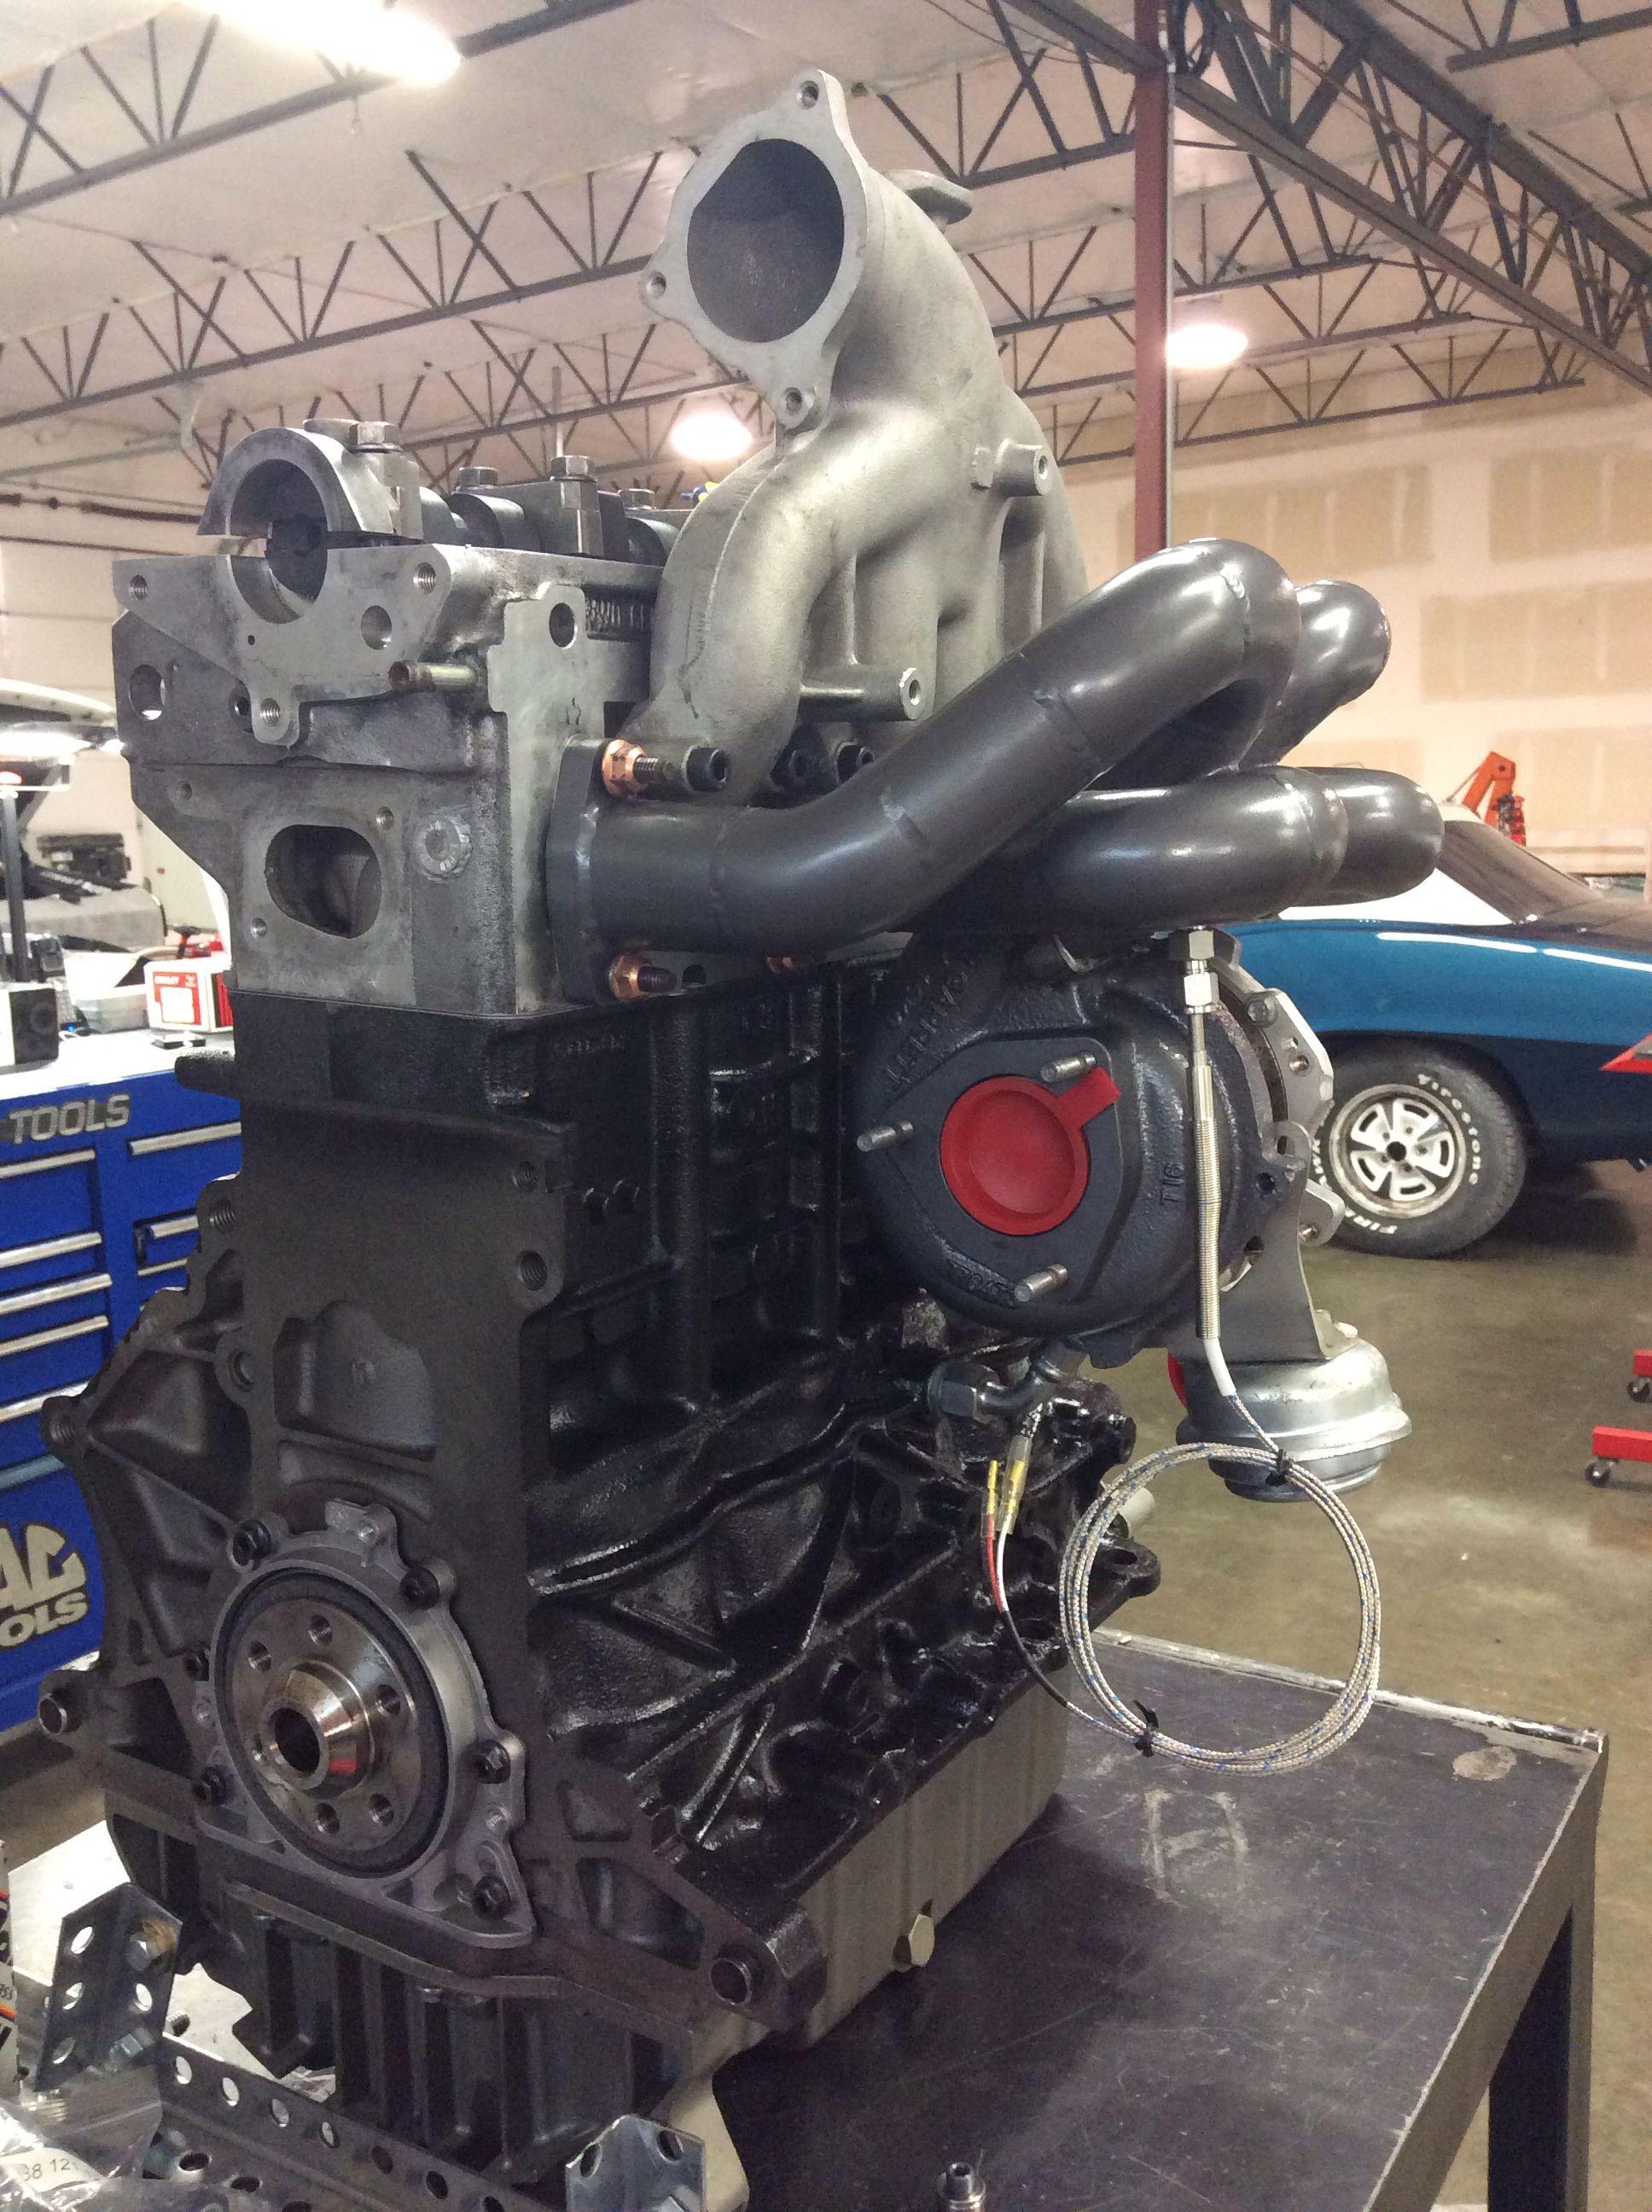 GTB2260VK Turbo, PD150 intake, Tubular exhaust, & ported head